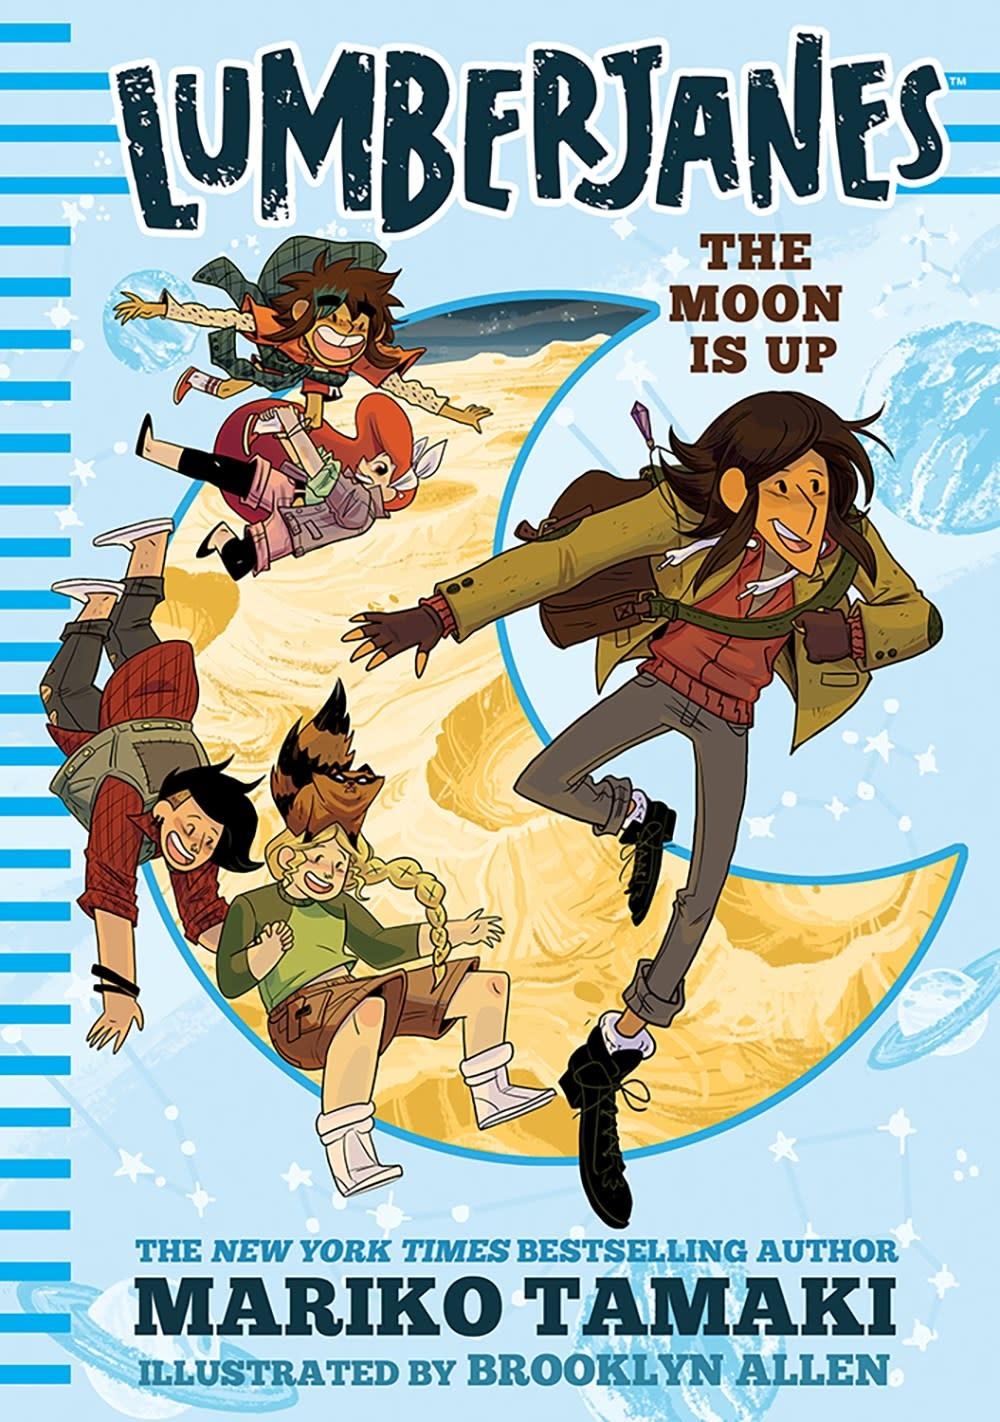 Amulet Paperbacks Lumberjanes 02 The Moon Is Up